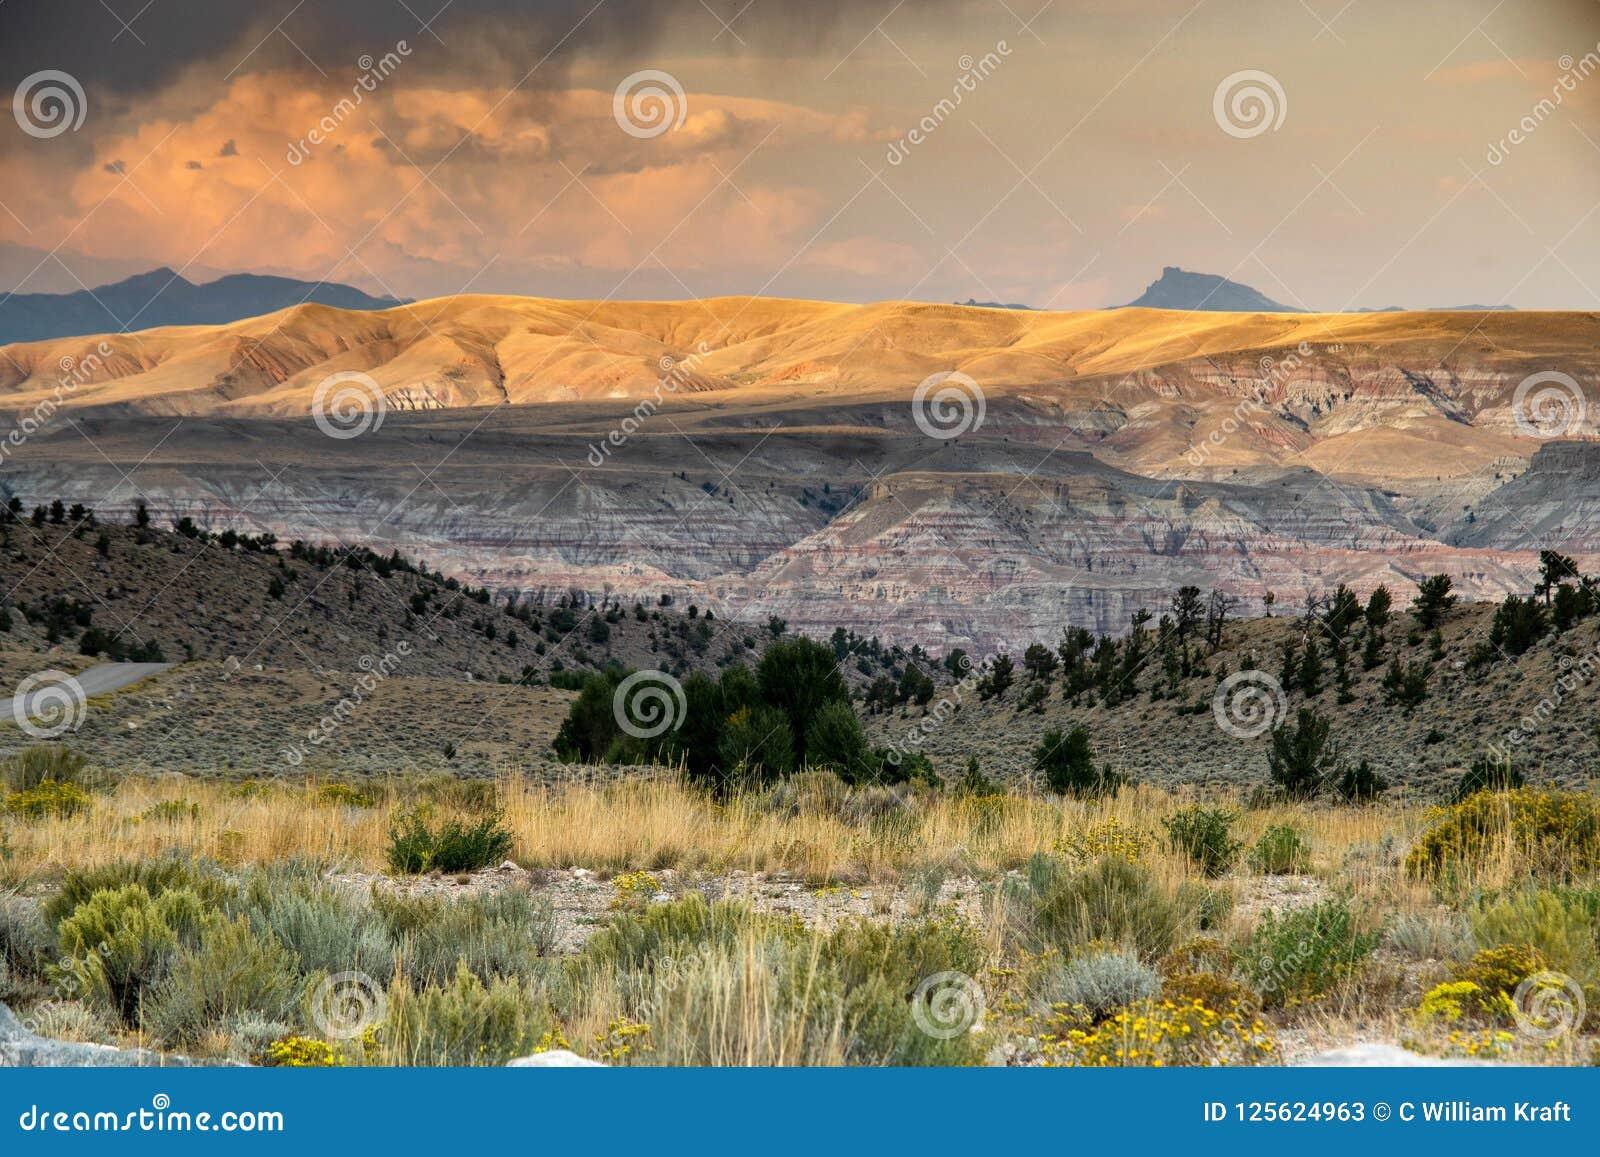 Bighorn Sheep Range